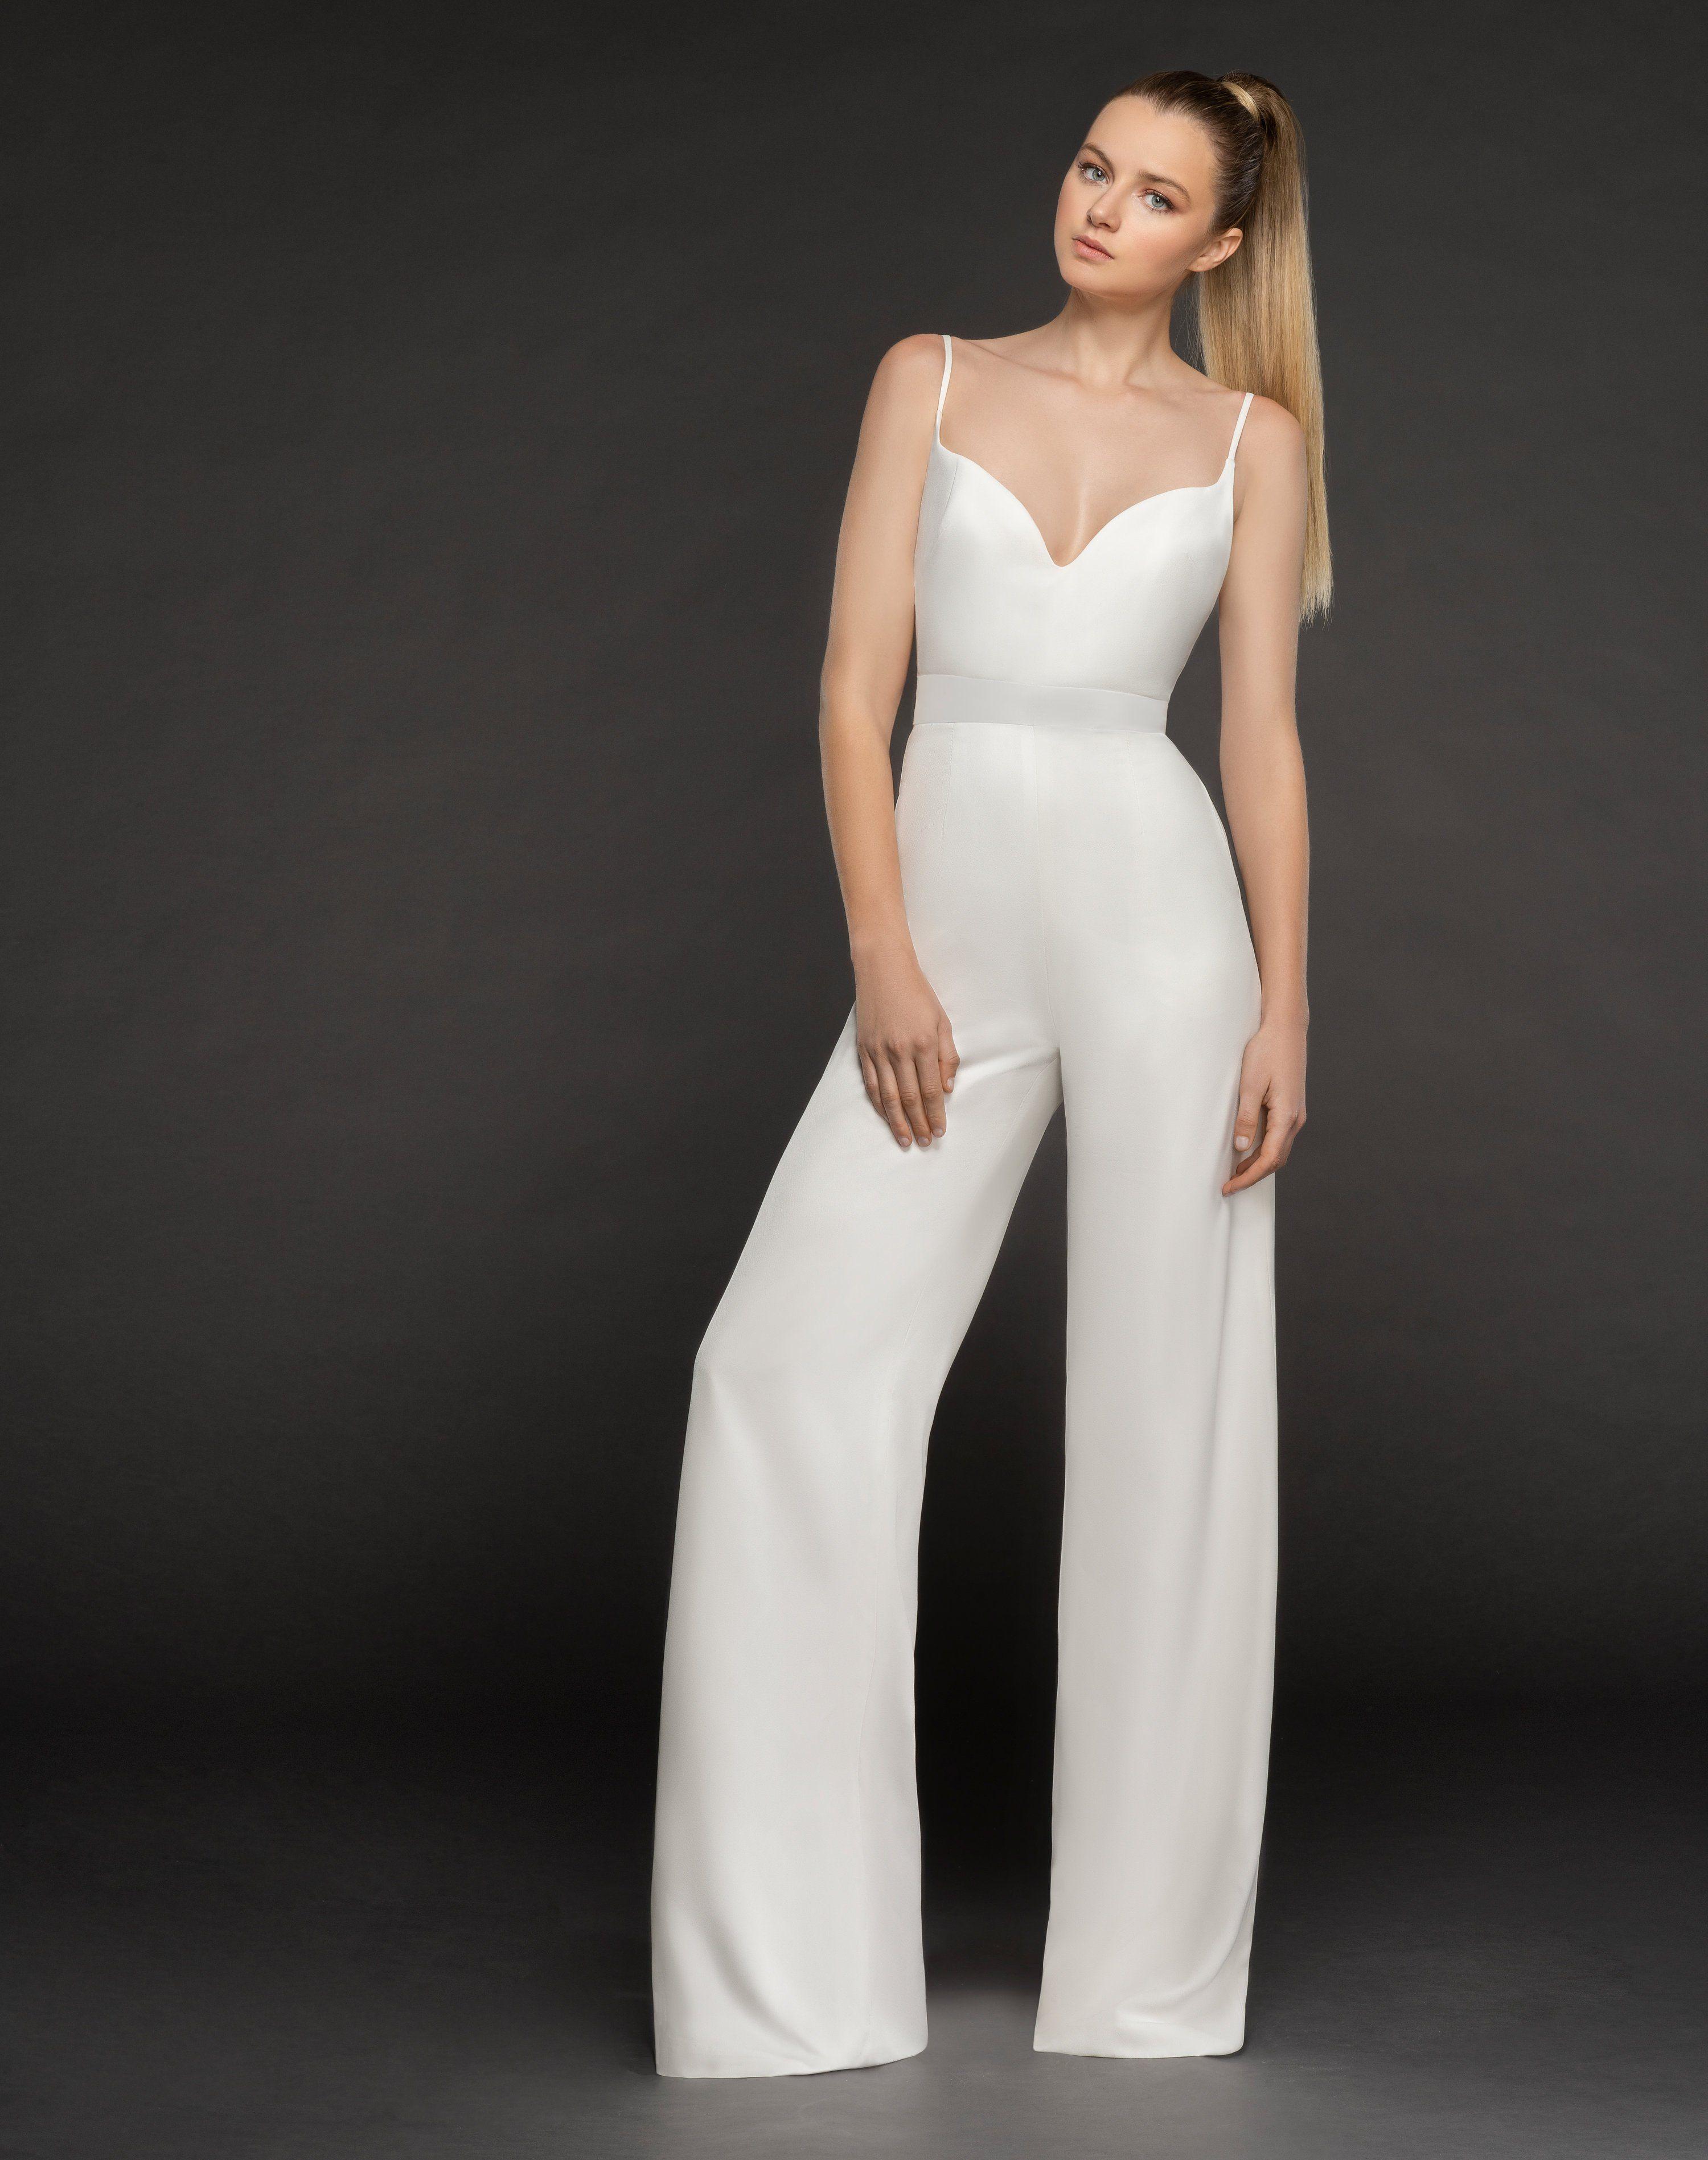 Blush By Hayley Paige Kim Sweetheart Bridal Jumpsuit Off White Bridesmaids Jumpsuits Jumpsuit Fashion Prom Jumpsuit